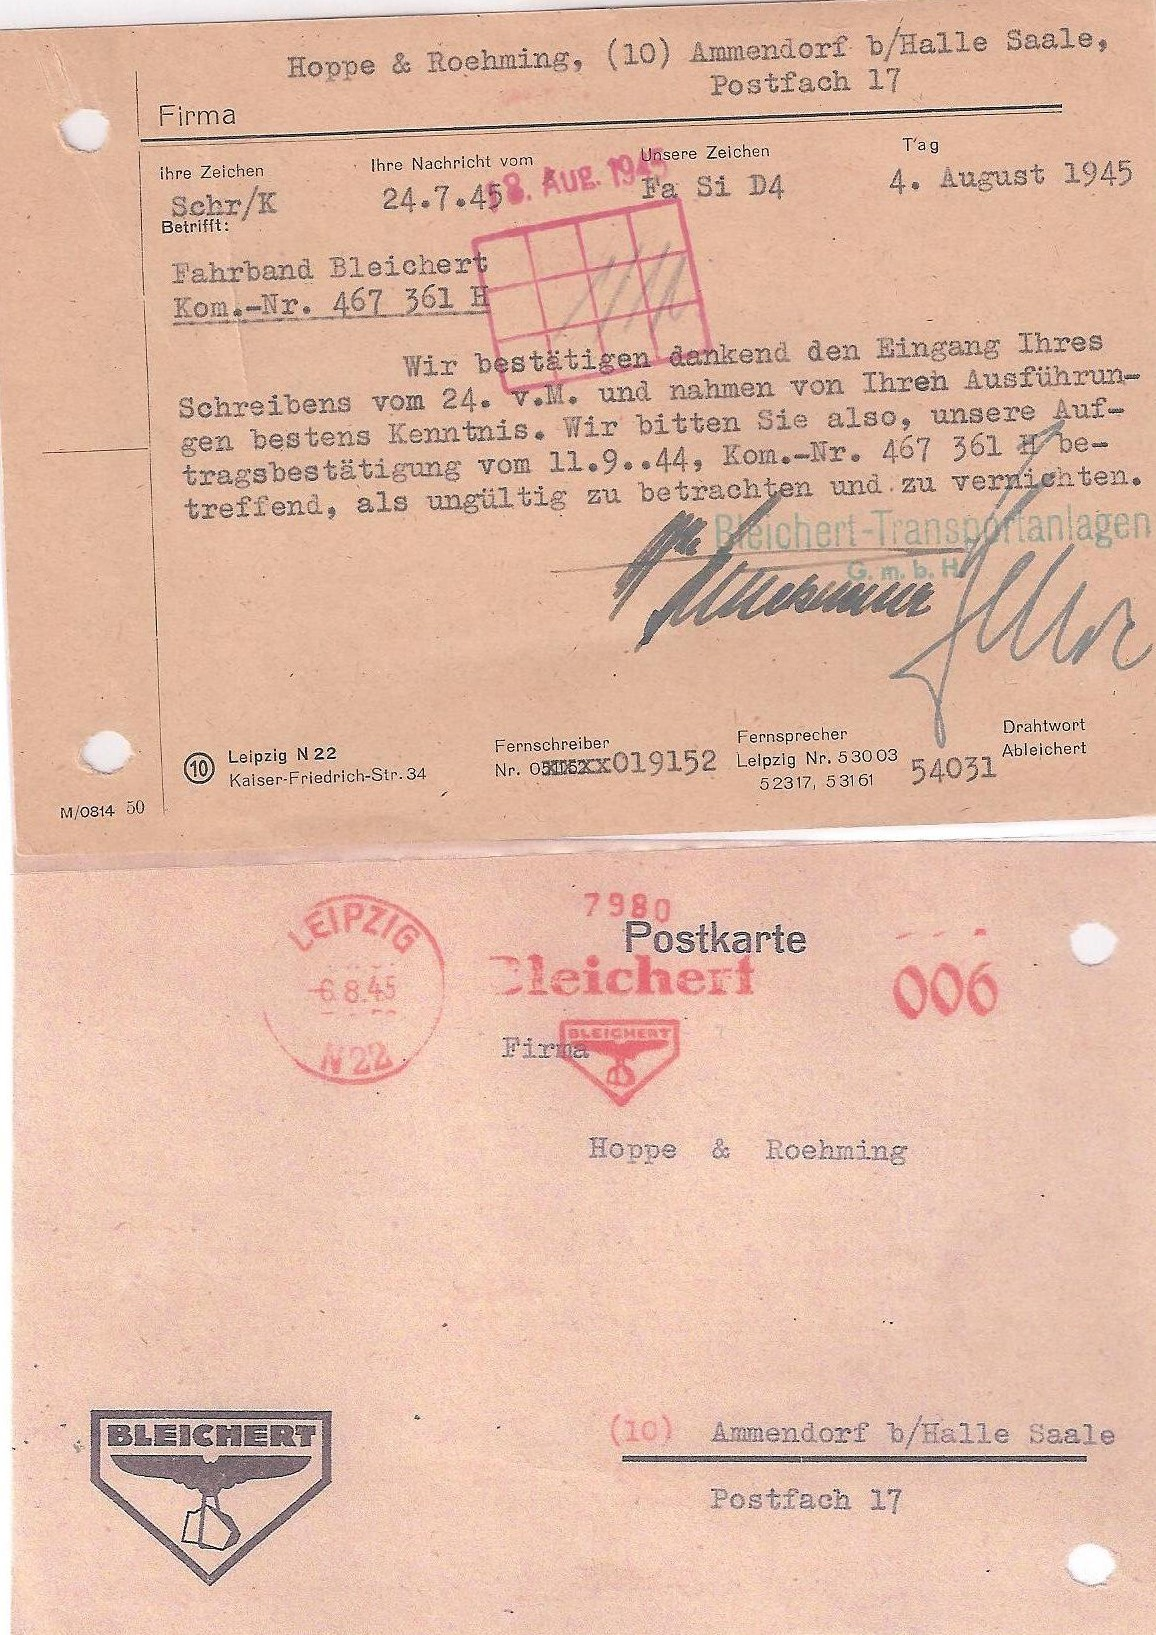 1945 Postcard